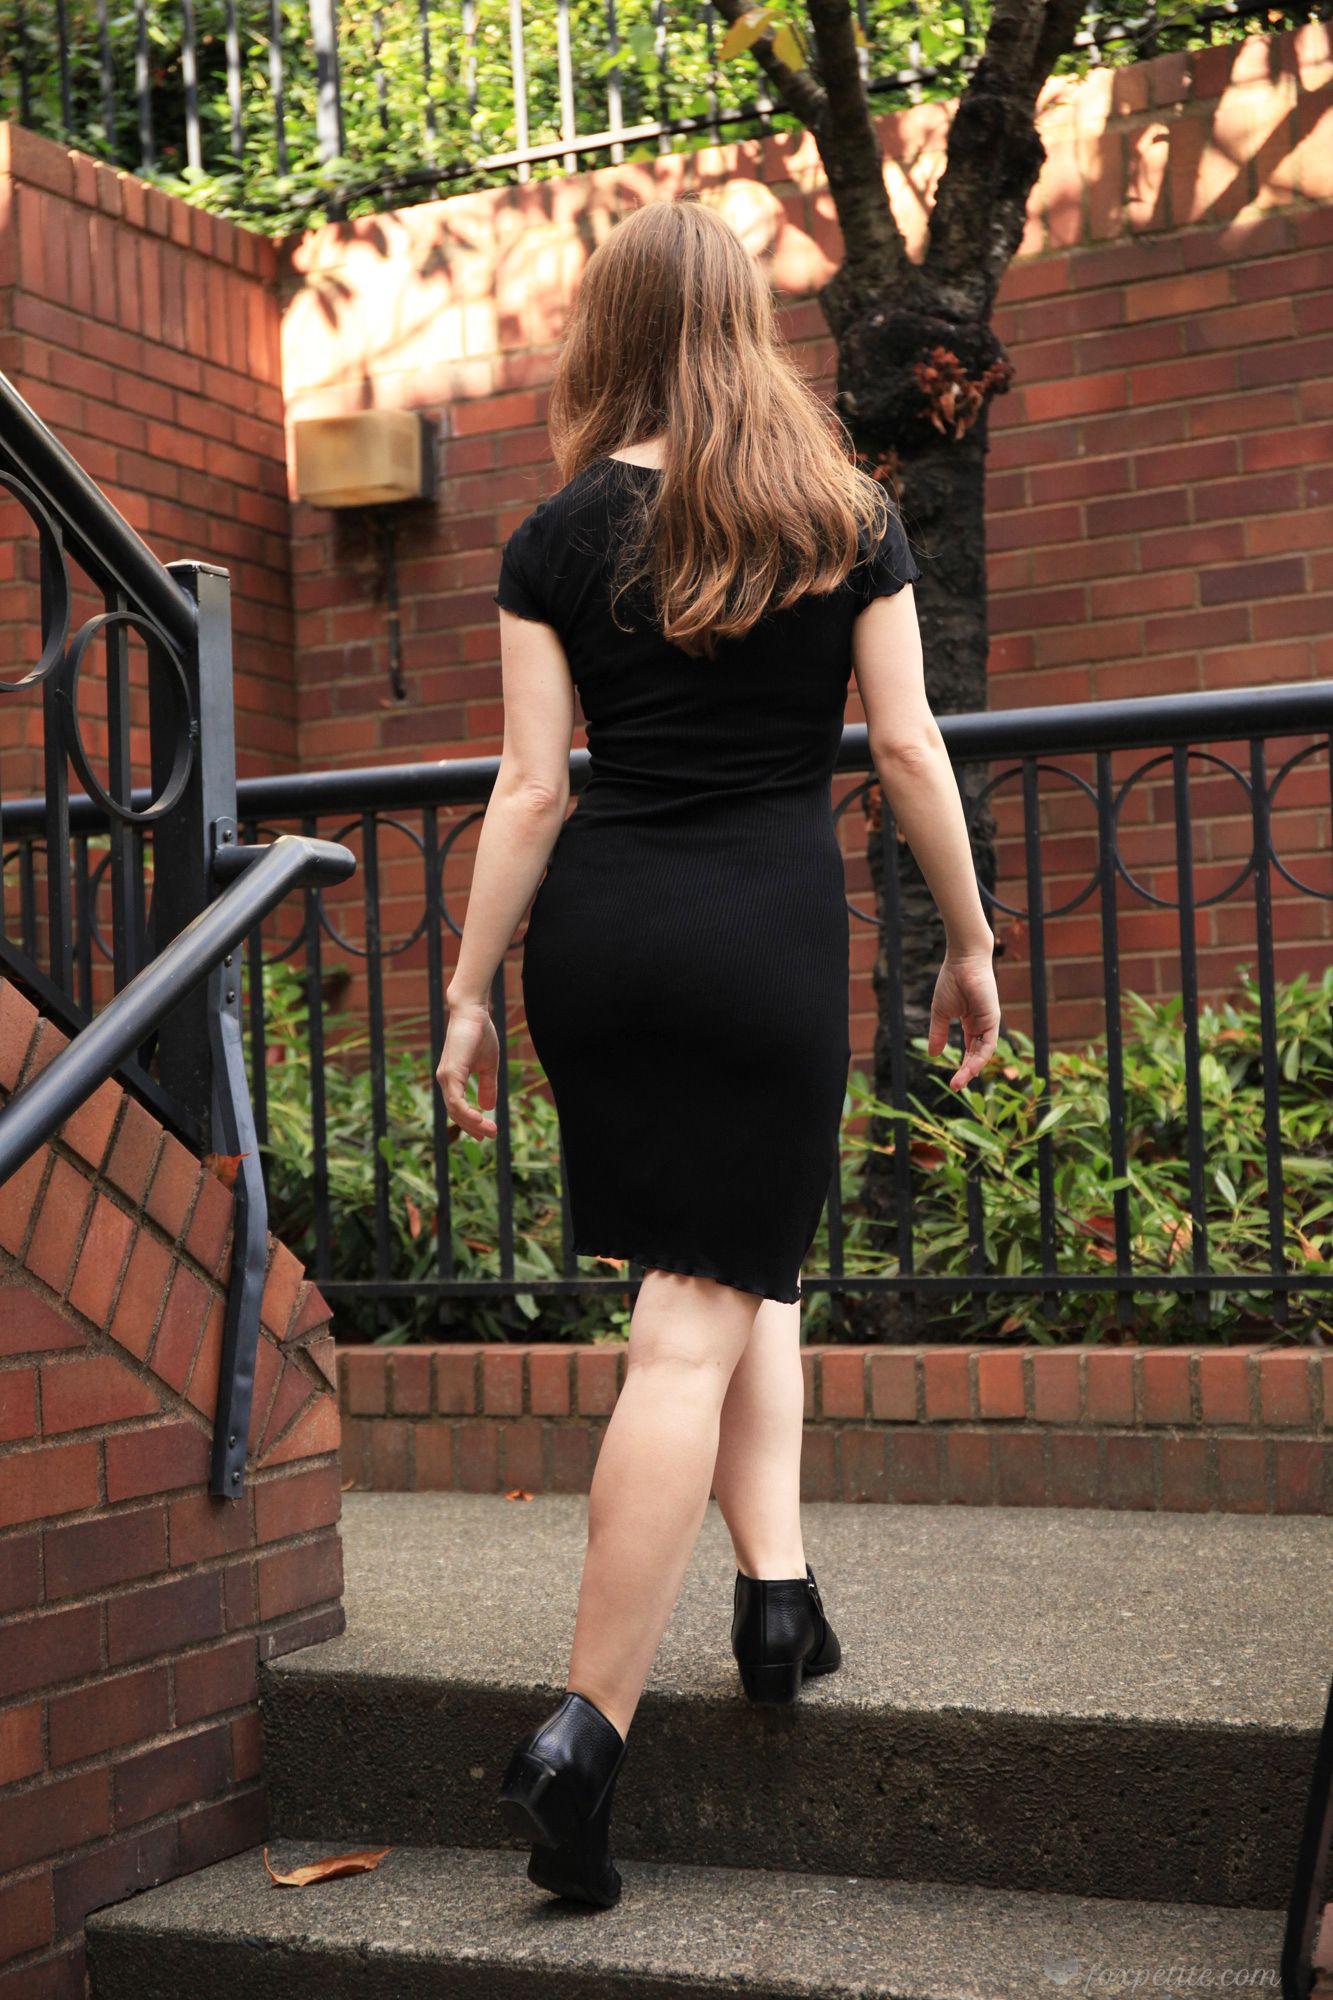 Black Mini Dress And Ankle Boots Aritzia Tna Inland Dress With Sam Edelman Petty Chelsea A Fashion For Petite Women Fashion Autumn Fashion Women Fall Outfits [ 2000 x 1333 Pixel ]